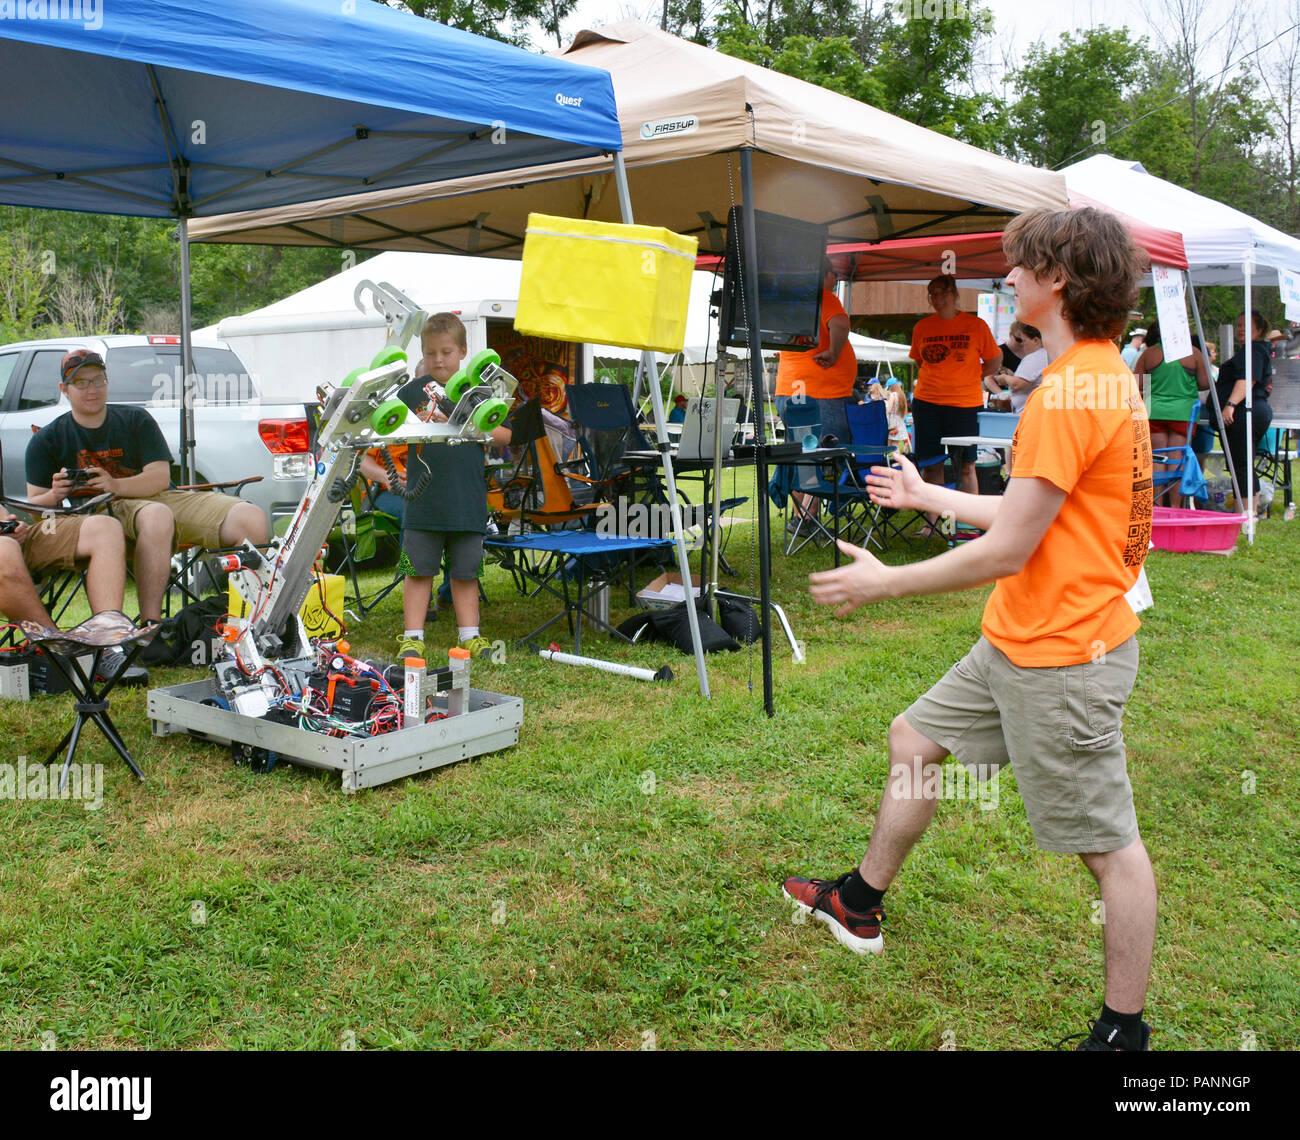 The Tigertrons Robotics Team demonstrate fun robotics at the 14th Annual Tunkhannock River Day 2018 at Riverside Park Tunkhannock  Pennsylvania USA Stock Photo